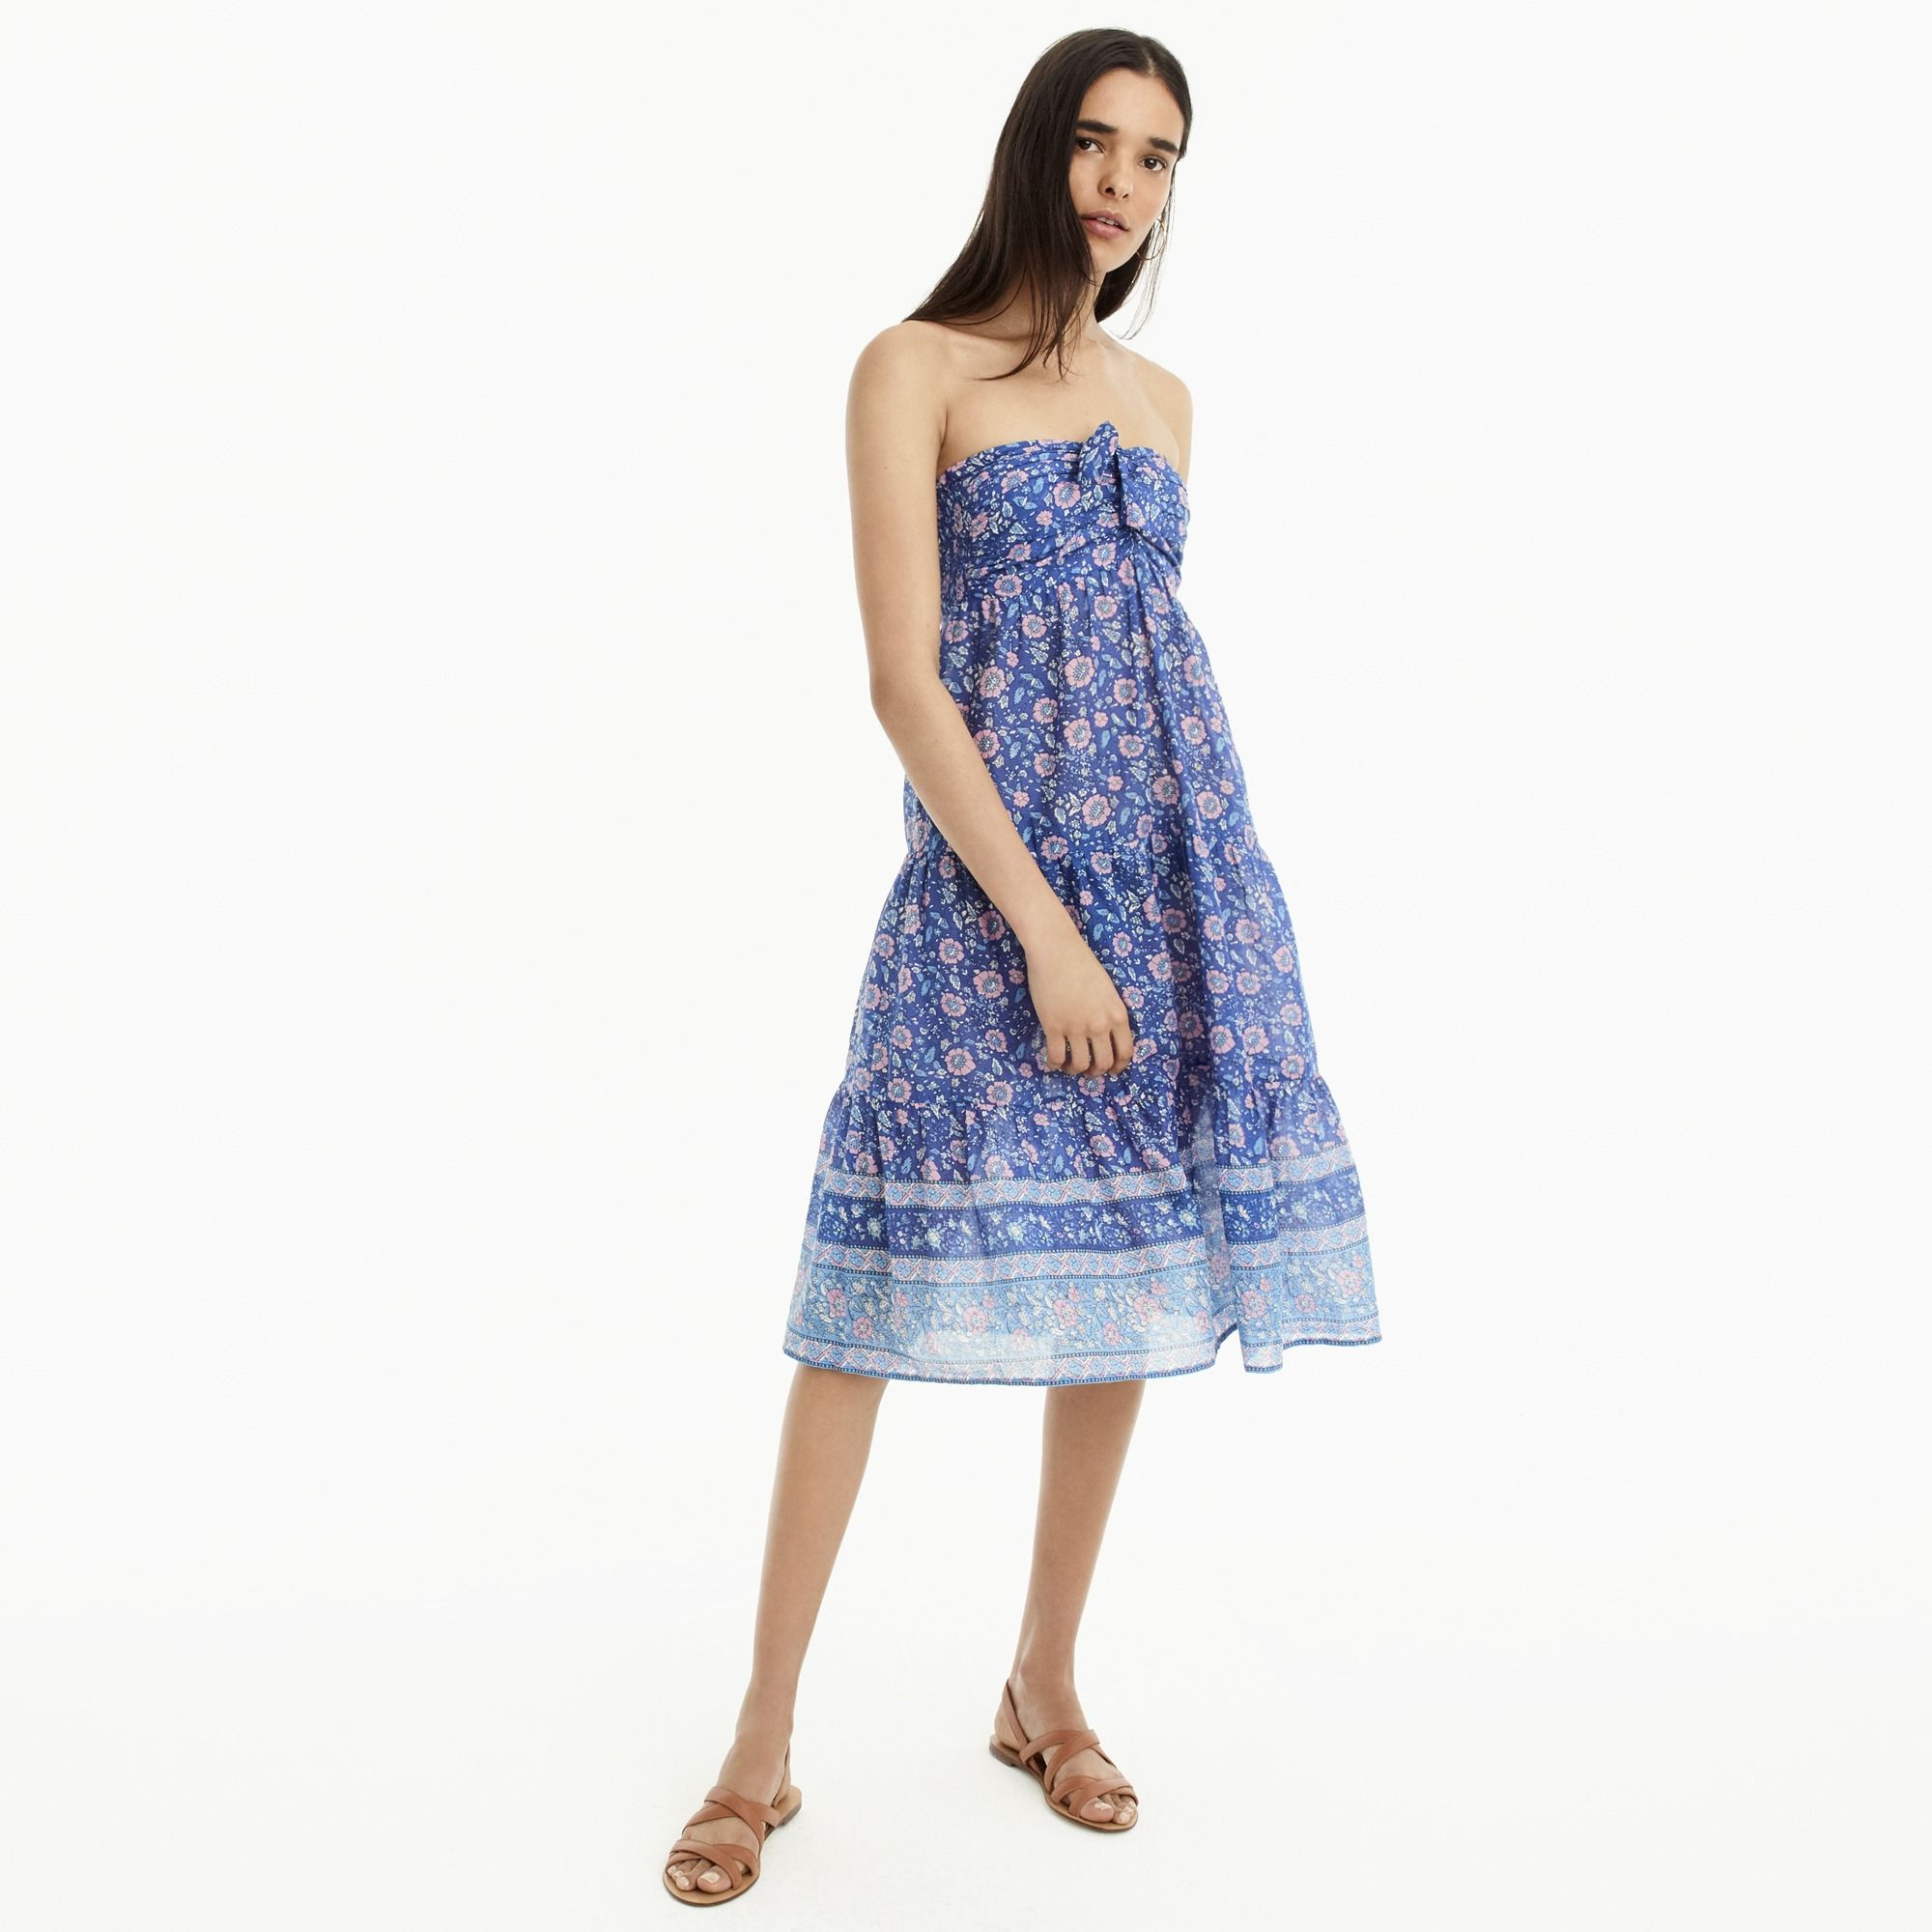 J Crew Strapless Dress In Floral Block Print Affiliate Resortwear Springfashion Summerfashion Strapless D Strapless Floral Dress Dresses Strapless Dress